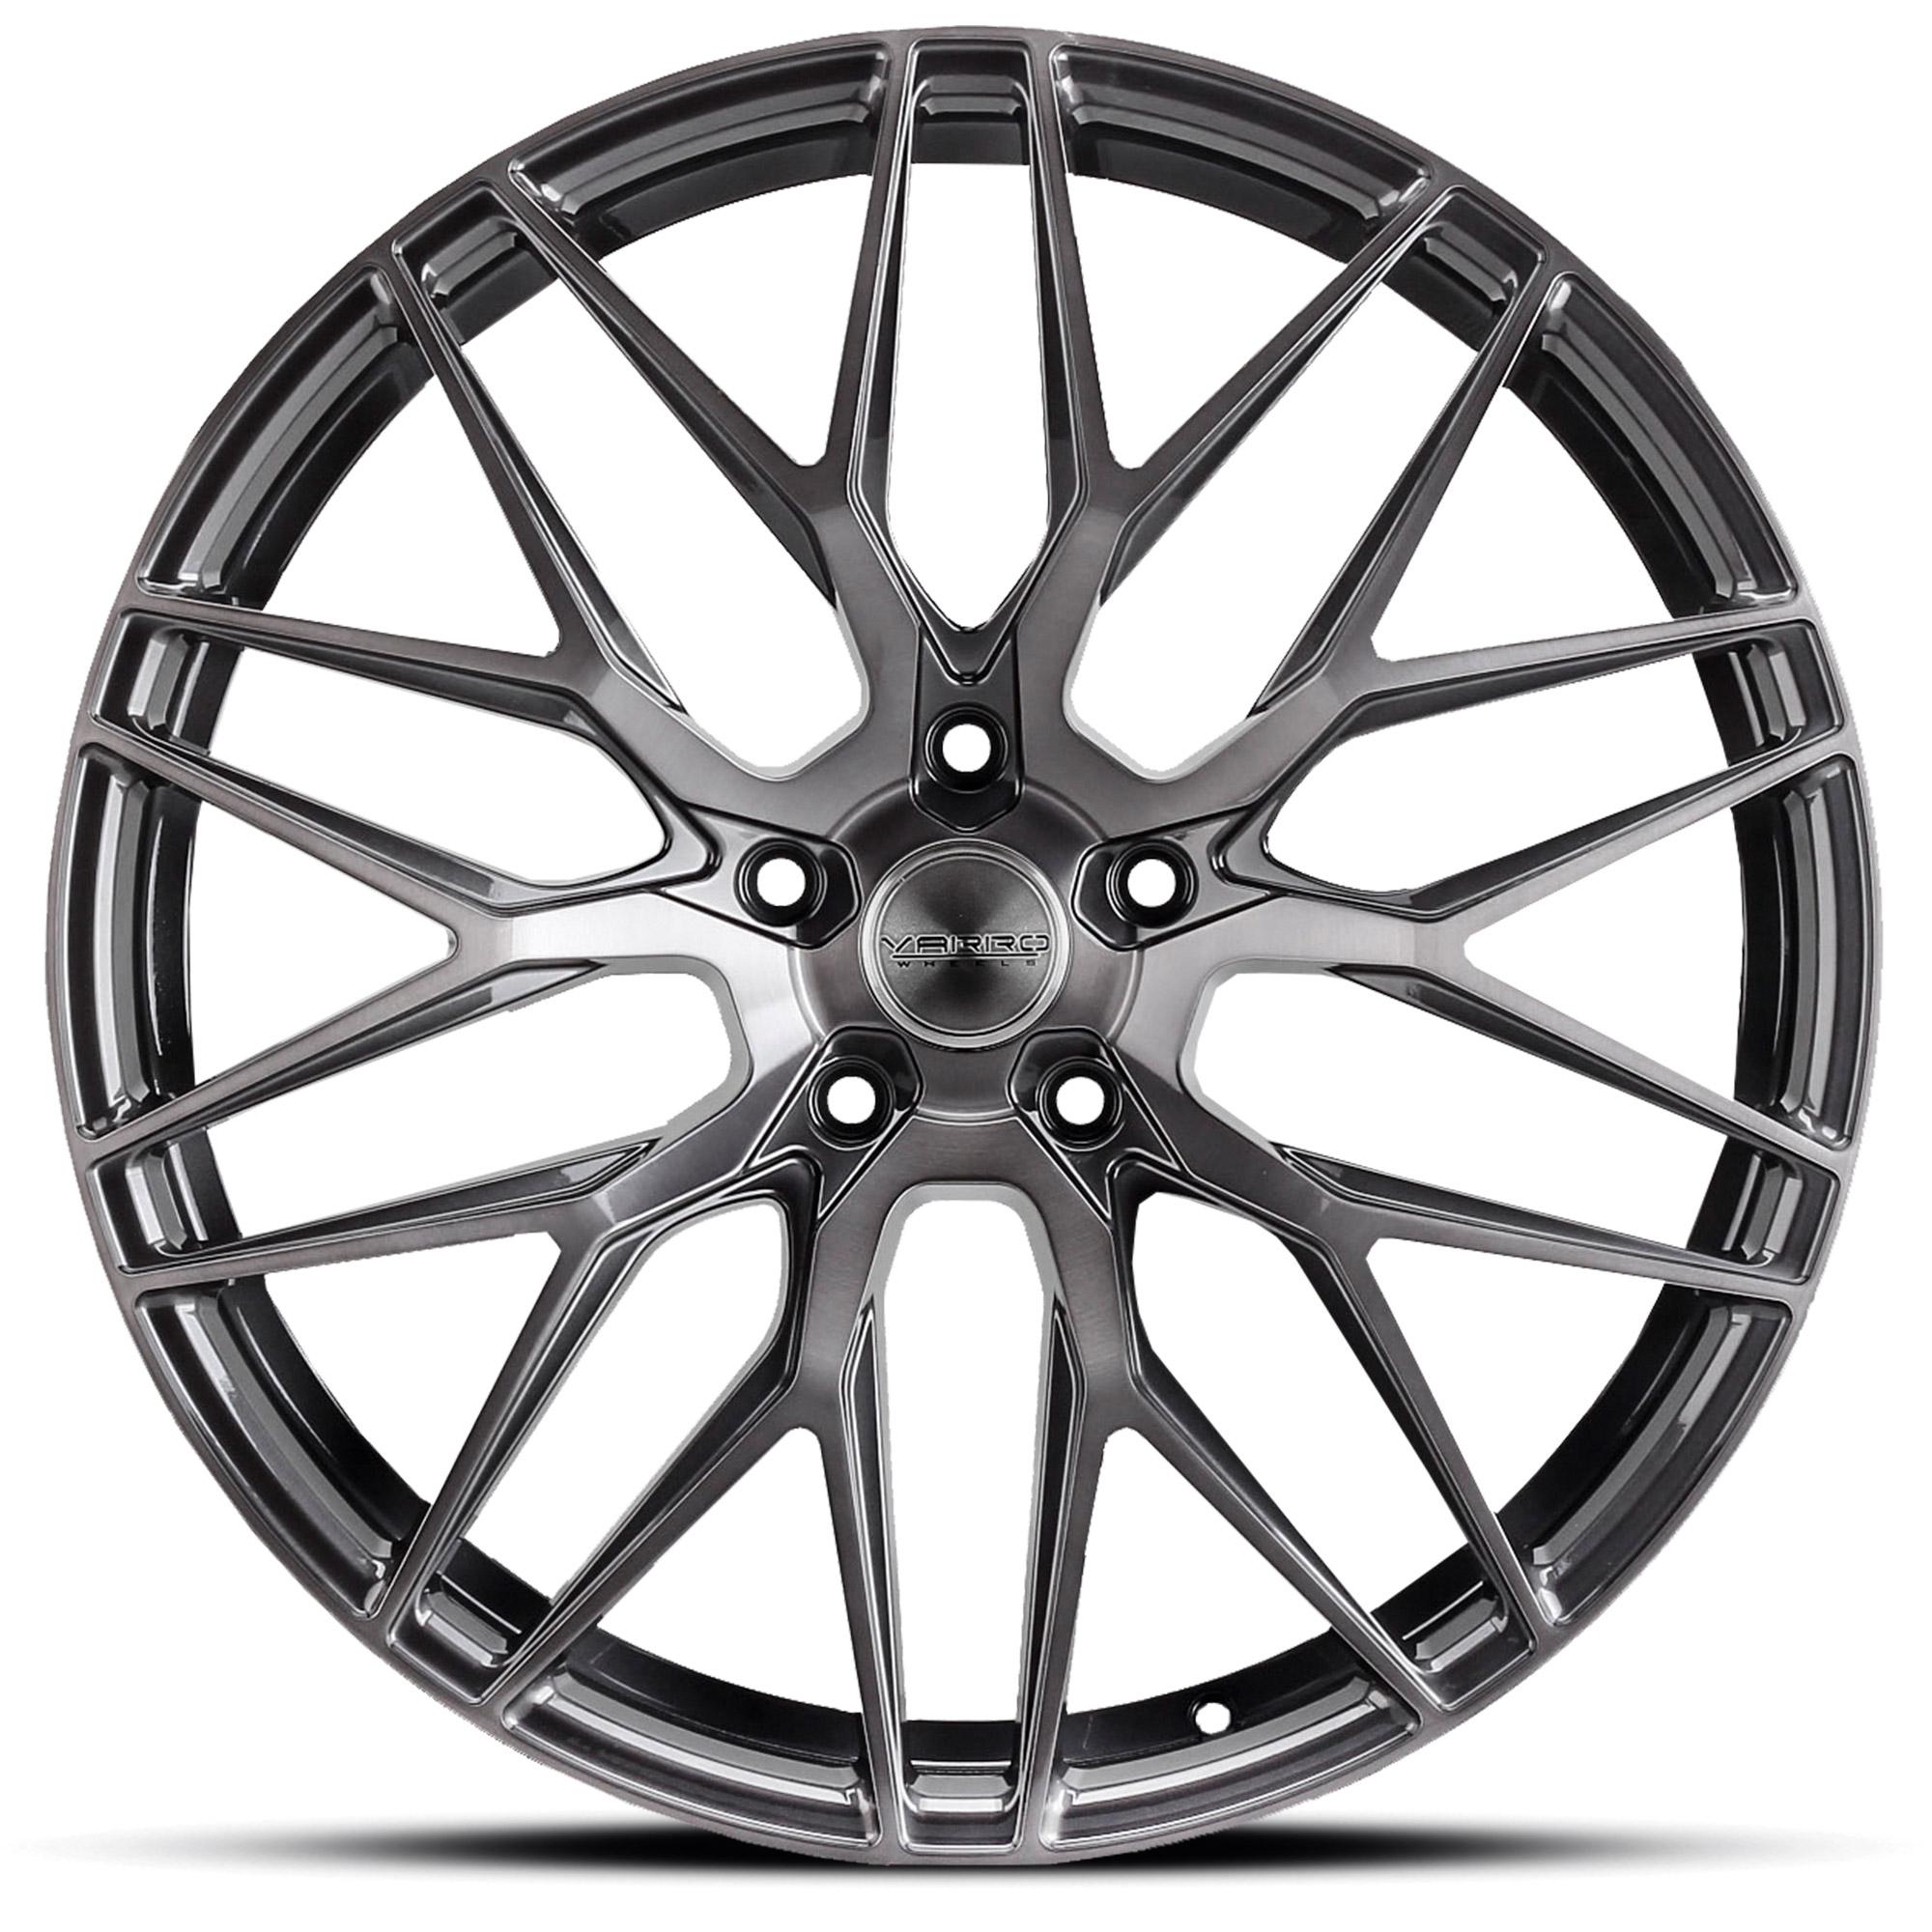 vd06 spin f ed varro wheels 2012 BMW X5 titanium w brushed face